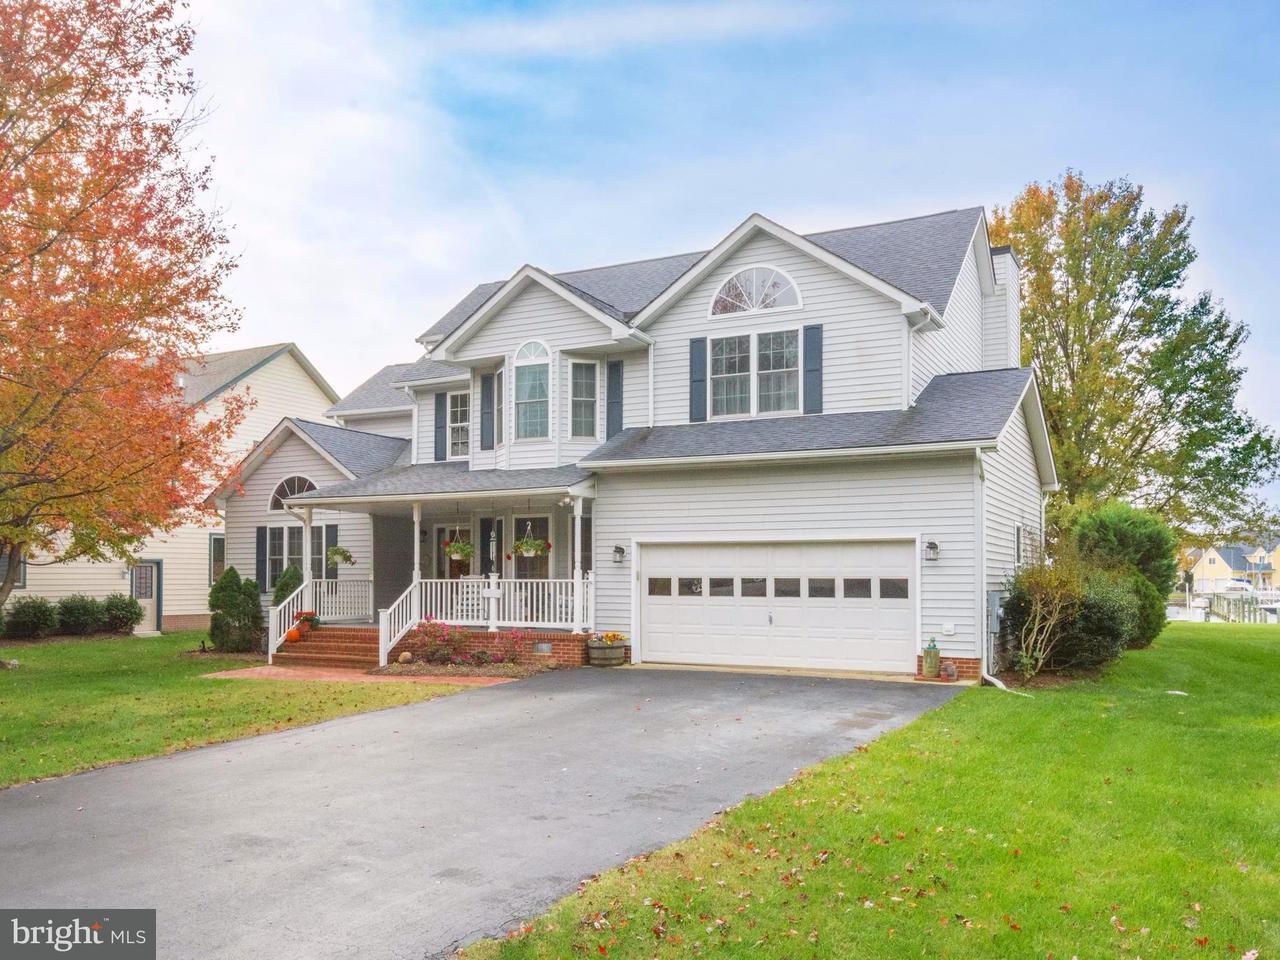 Vivienda unifamiliar por un Venta en 17715 WHITESTONE Drive 17715 WHITESTONE Drive Tall Timbers, Maryland 20690 Estados Unidos